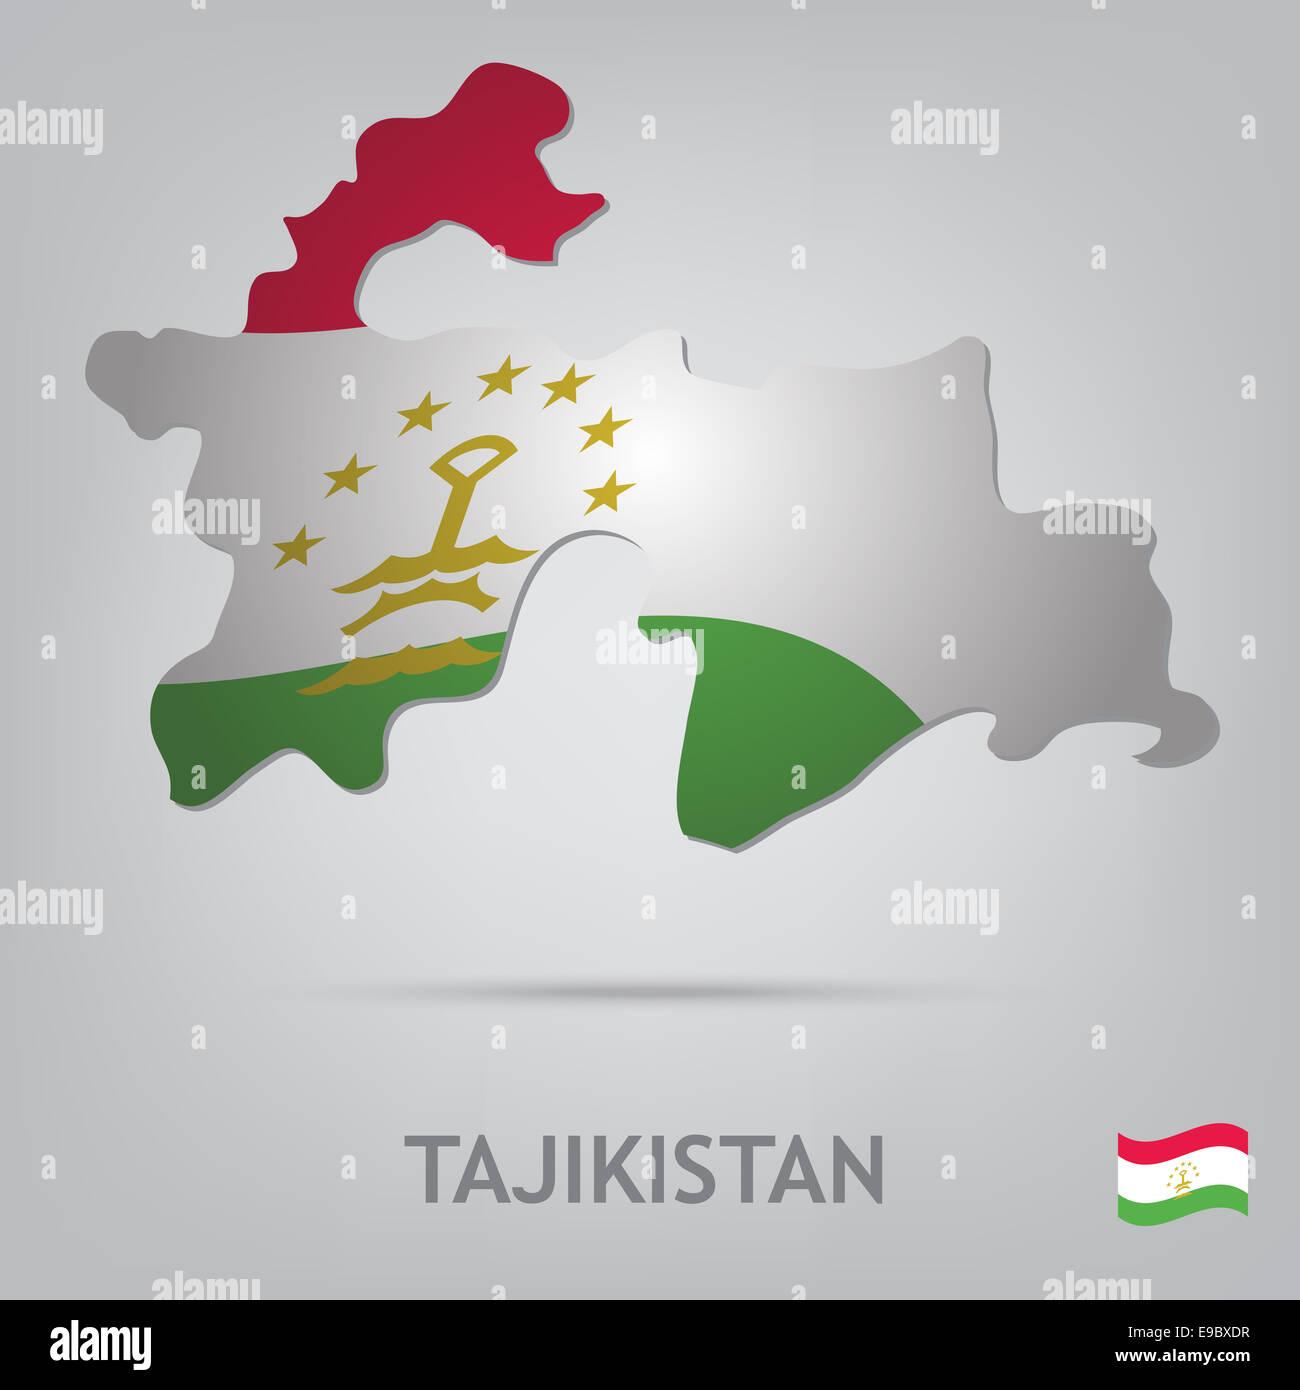 tajikistan - Stock Image